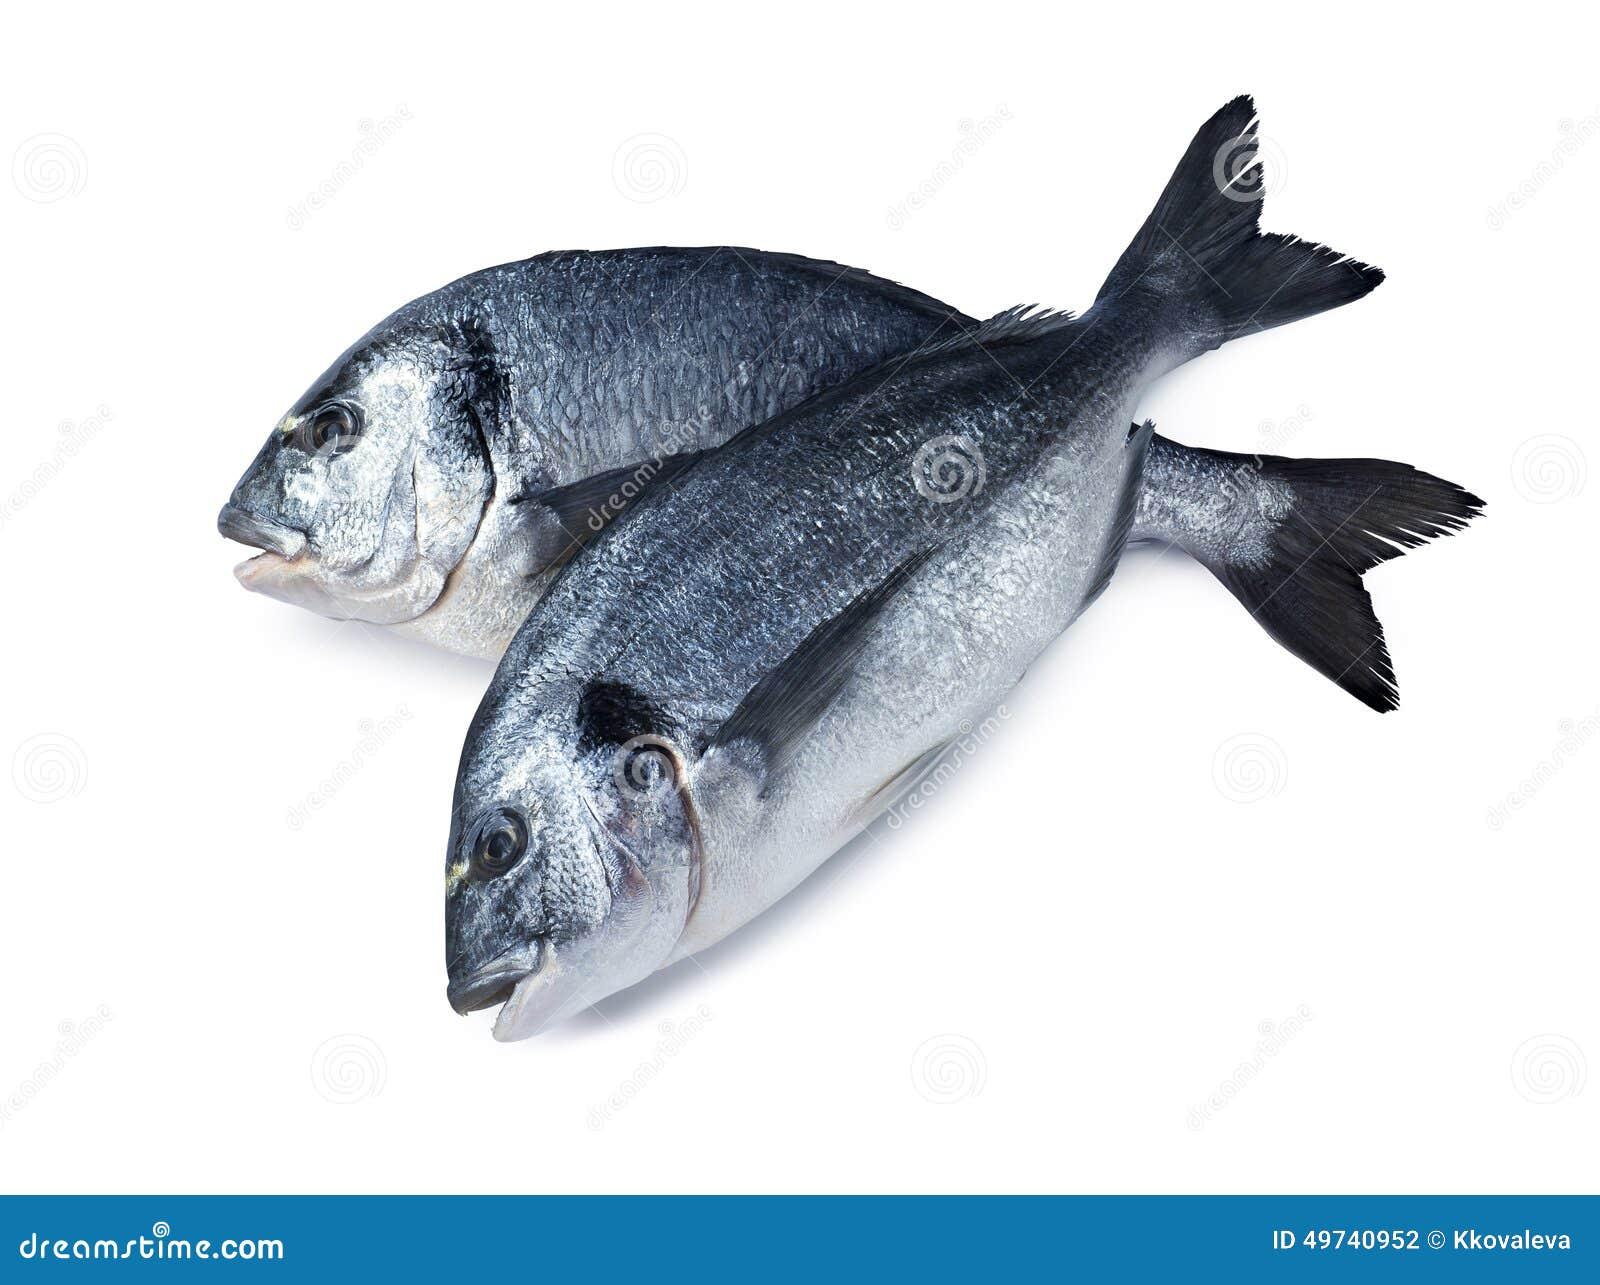 Two dorado fish crossed isolated on white background